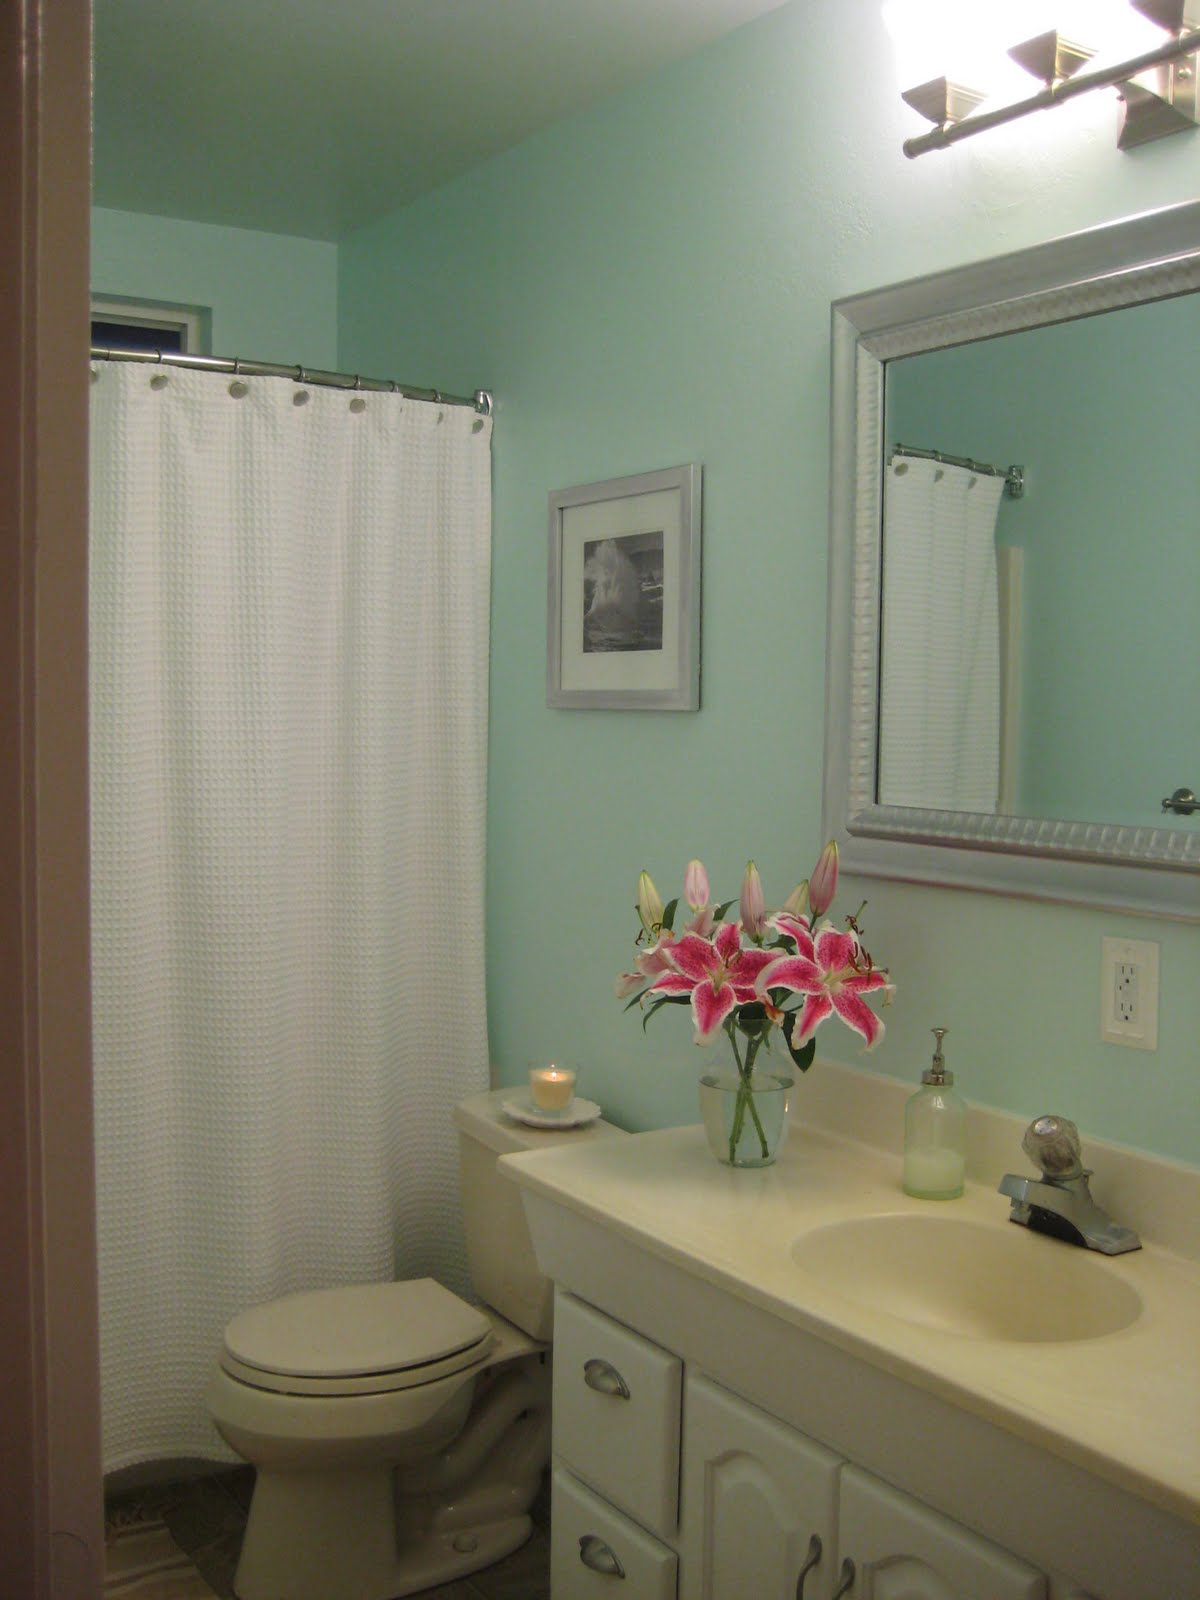 JPM Design: Project Update: My Bathroom